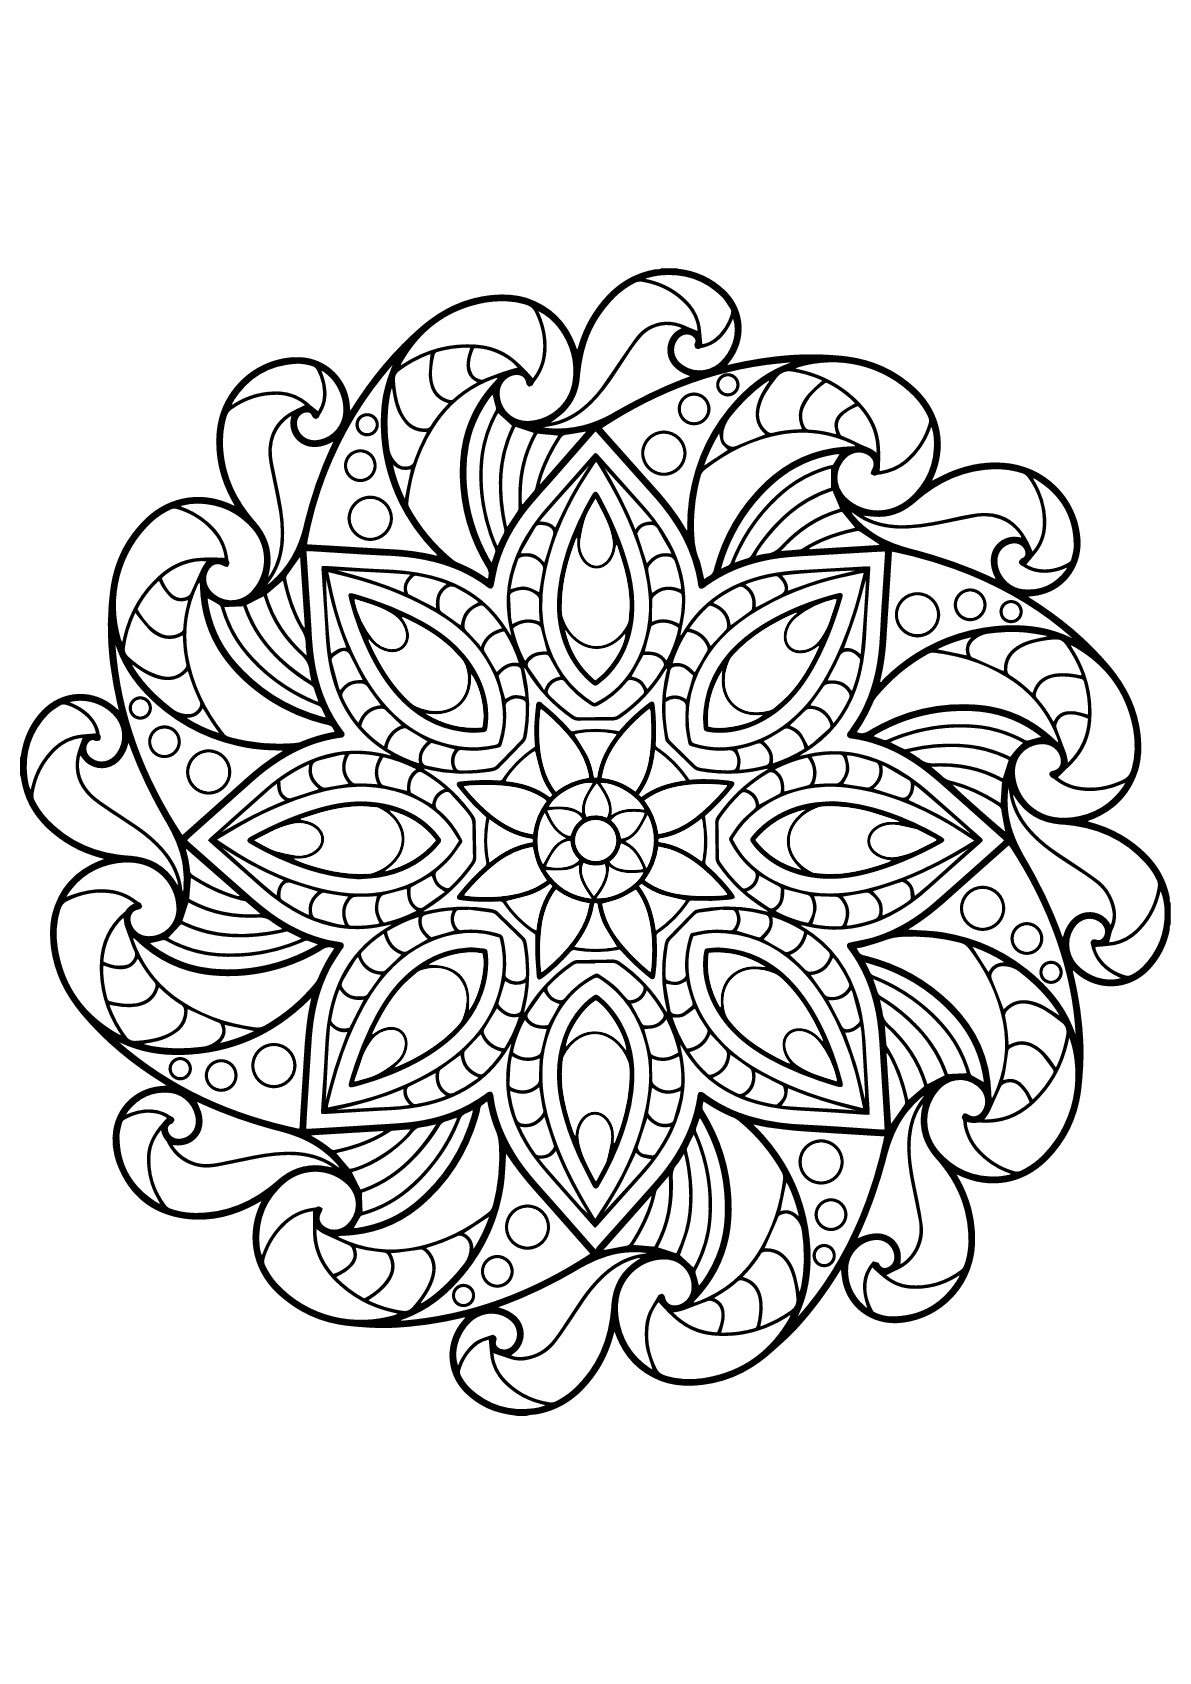 Mandala complexe livre gratuit 2 coloriage mandalas coloriages pour enfants - Mandalas a colorier gratuit ...